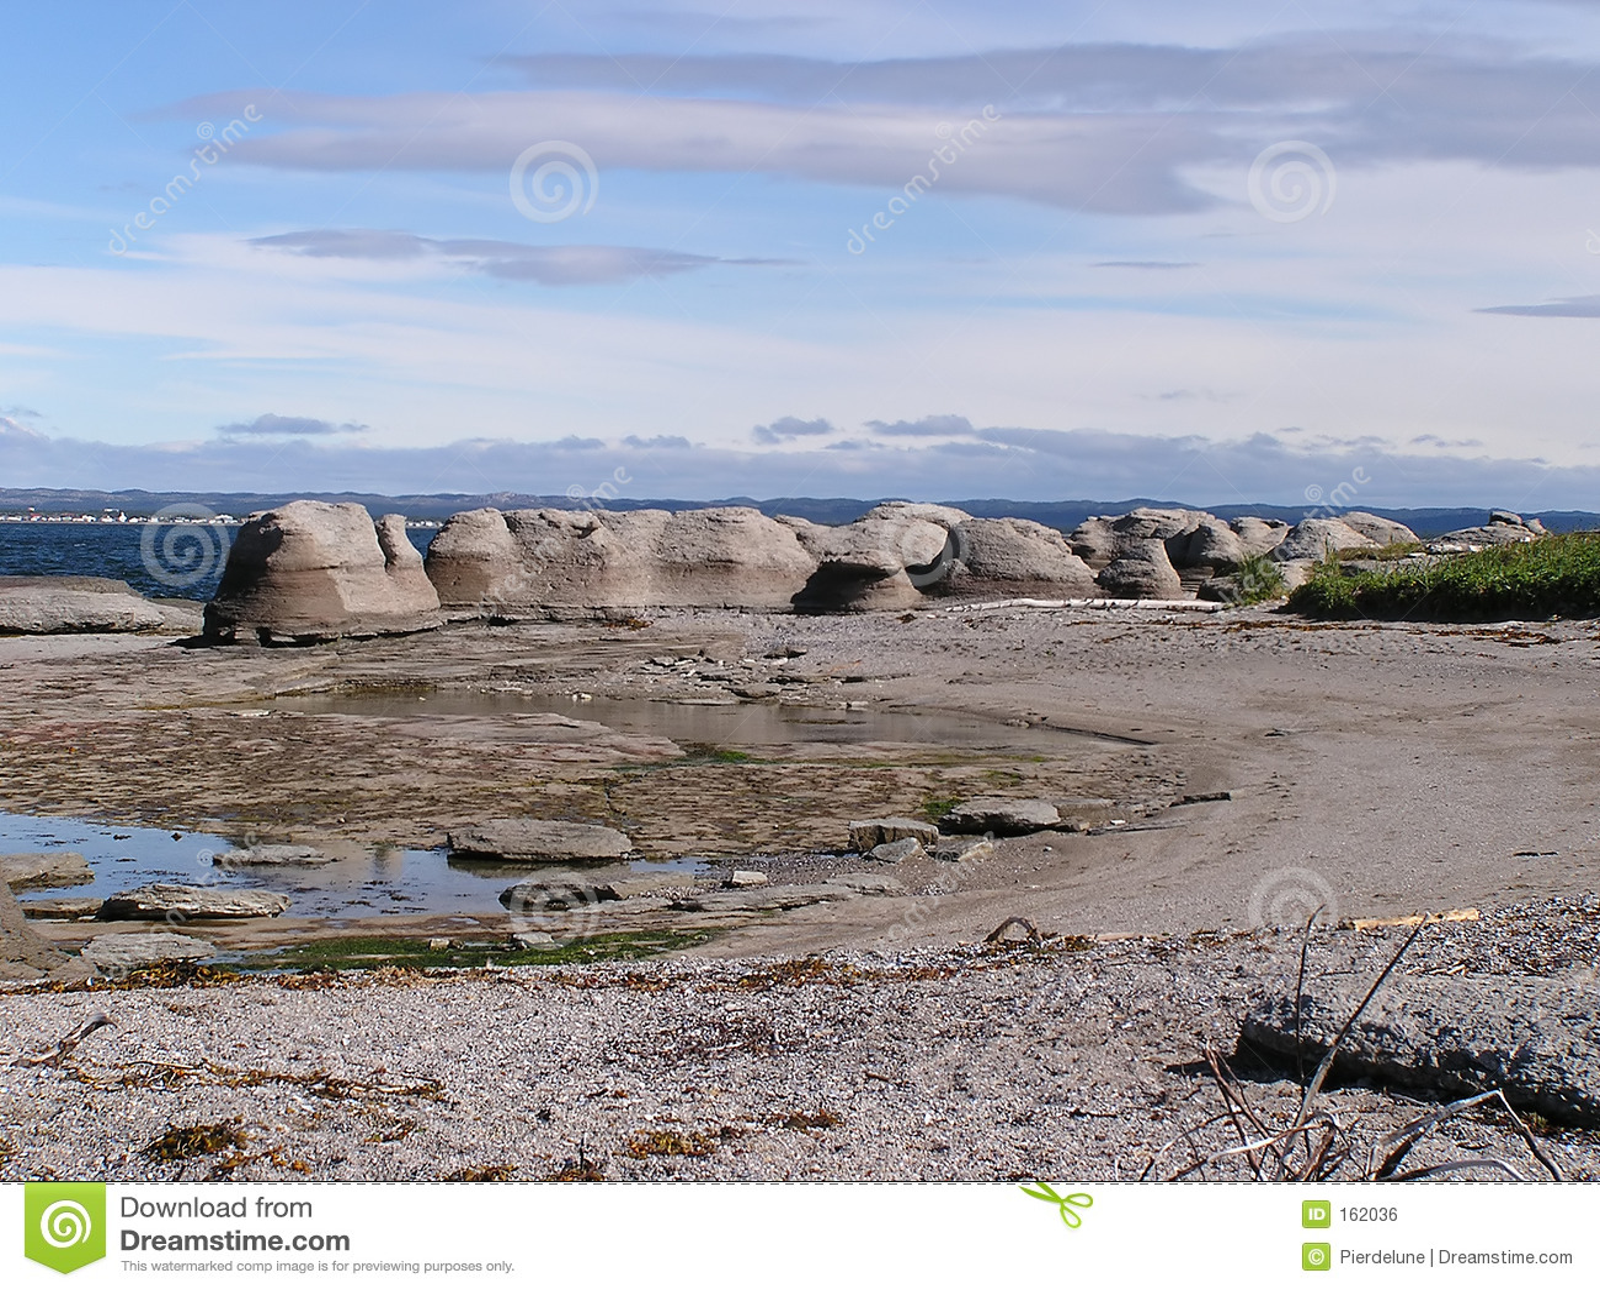 Limestone islands3